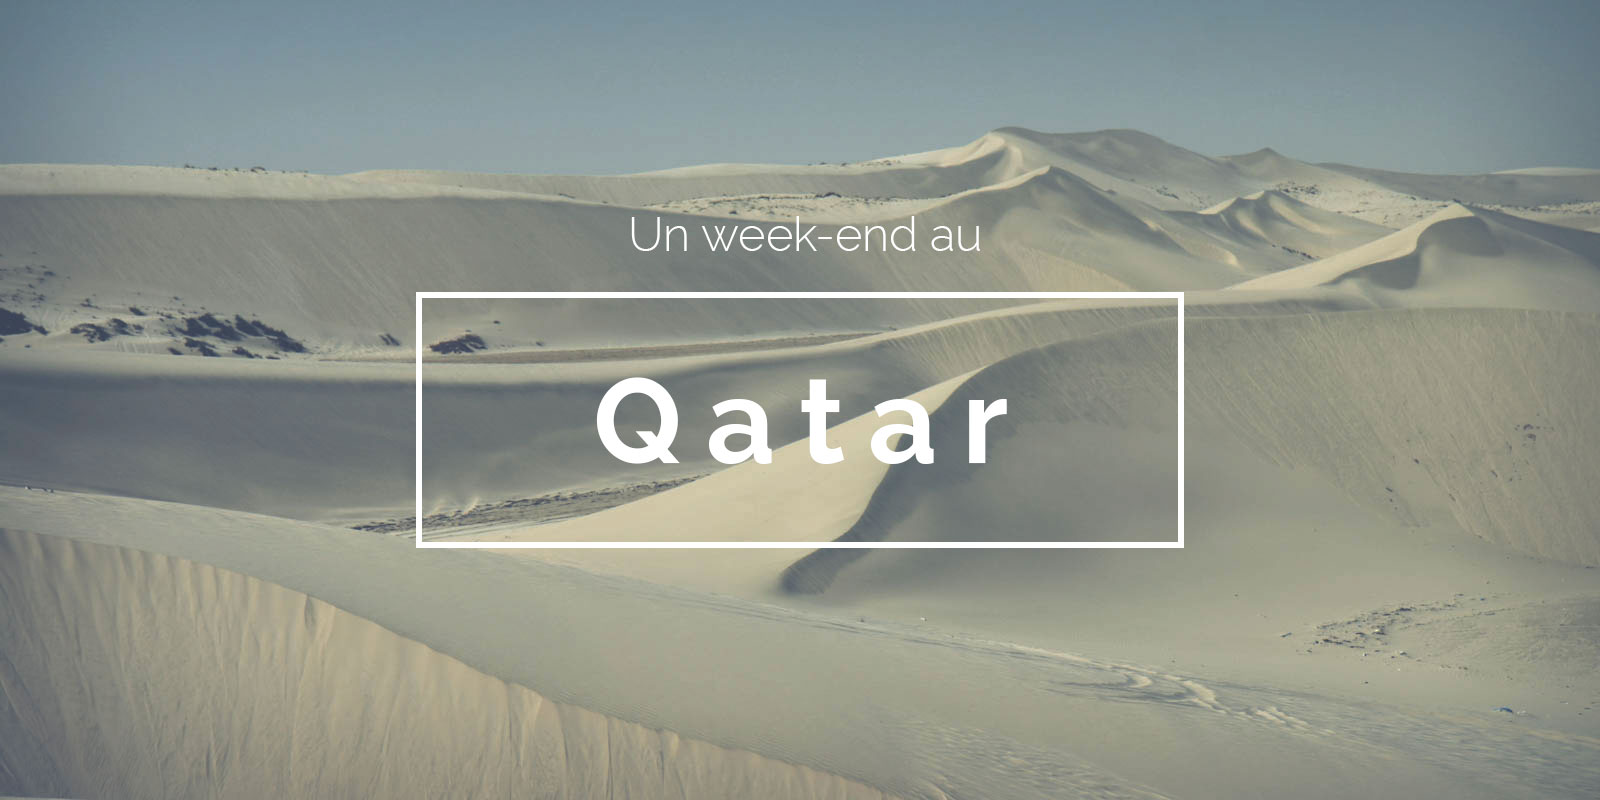 Qatar title